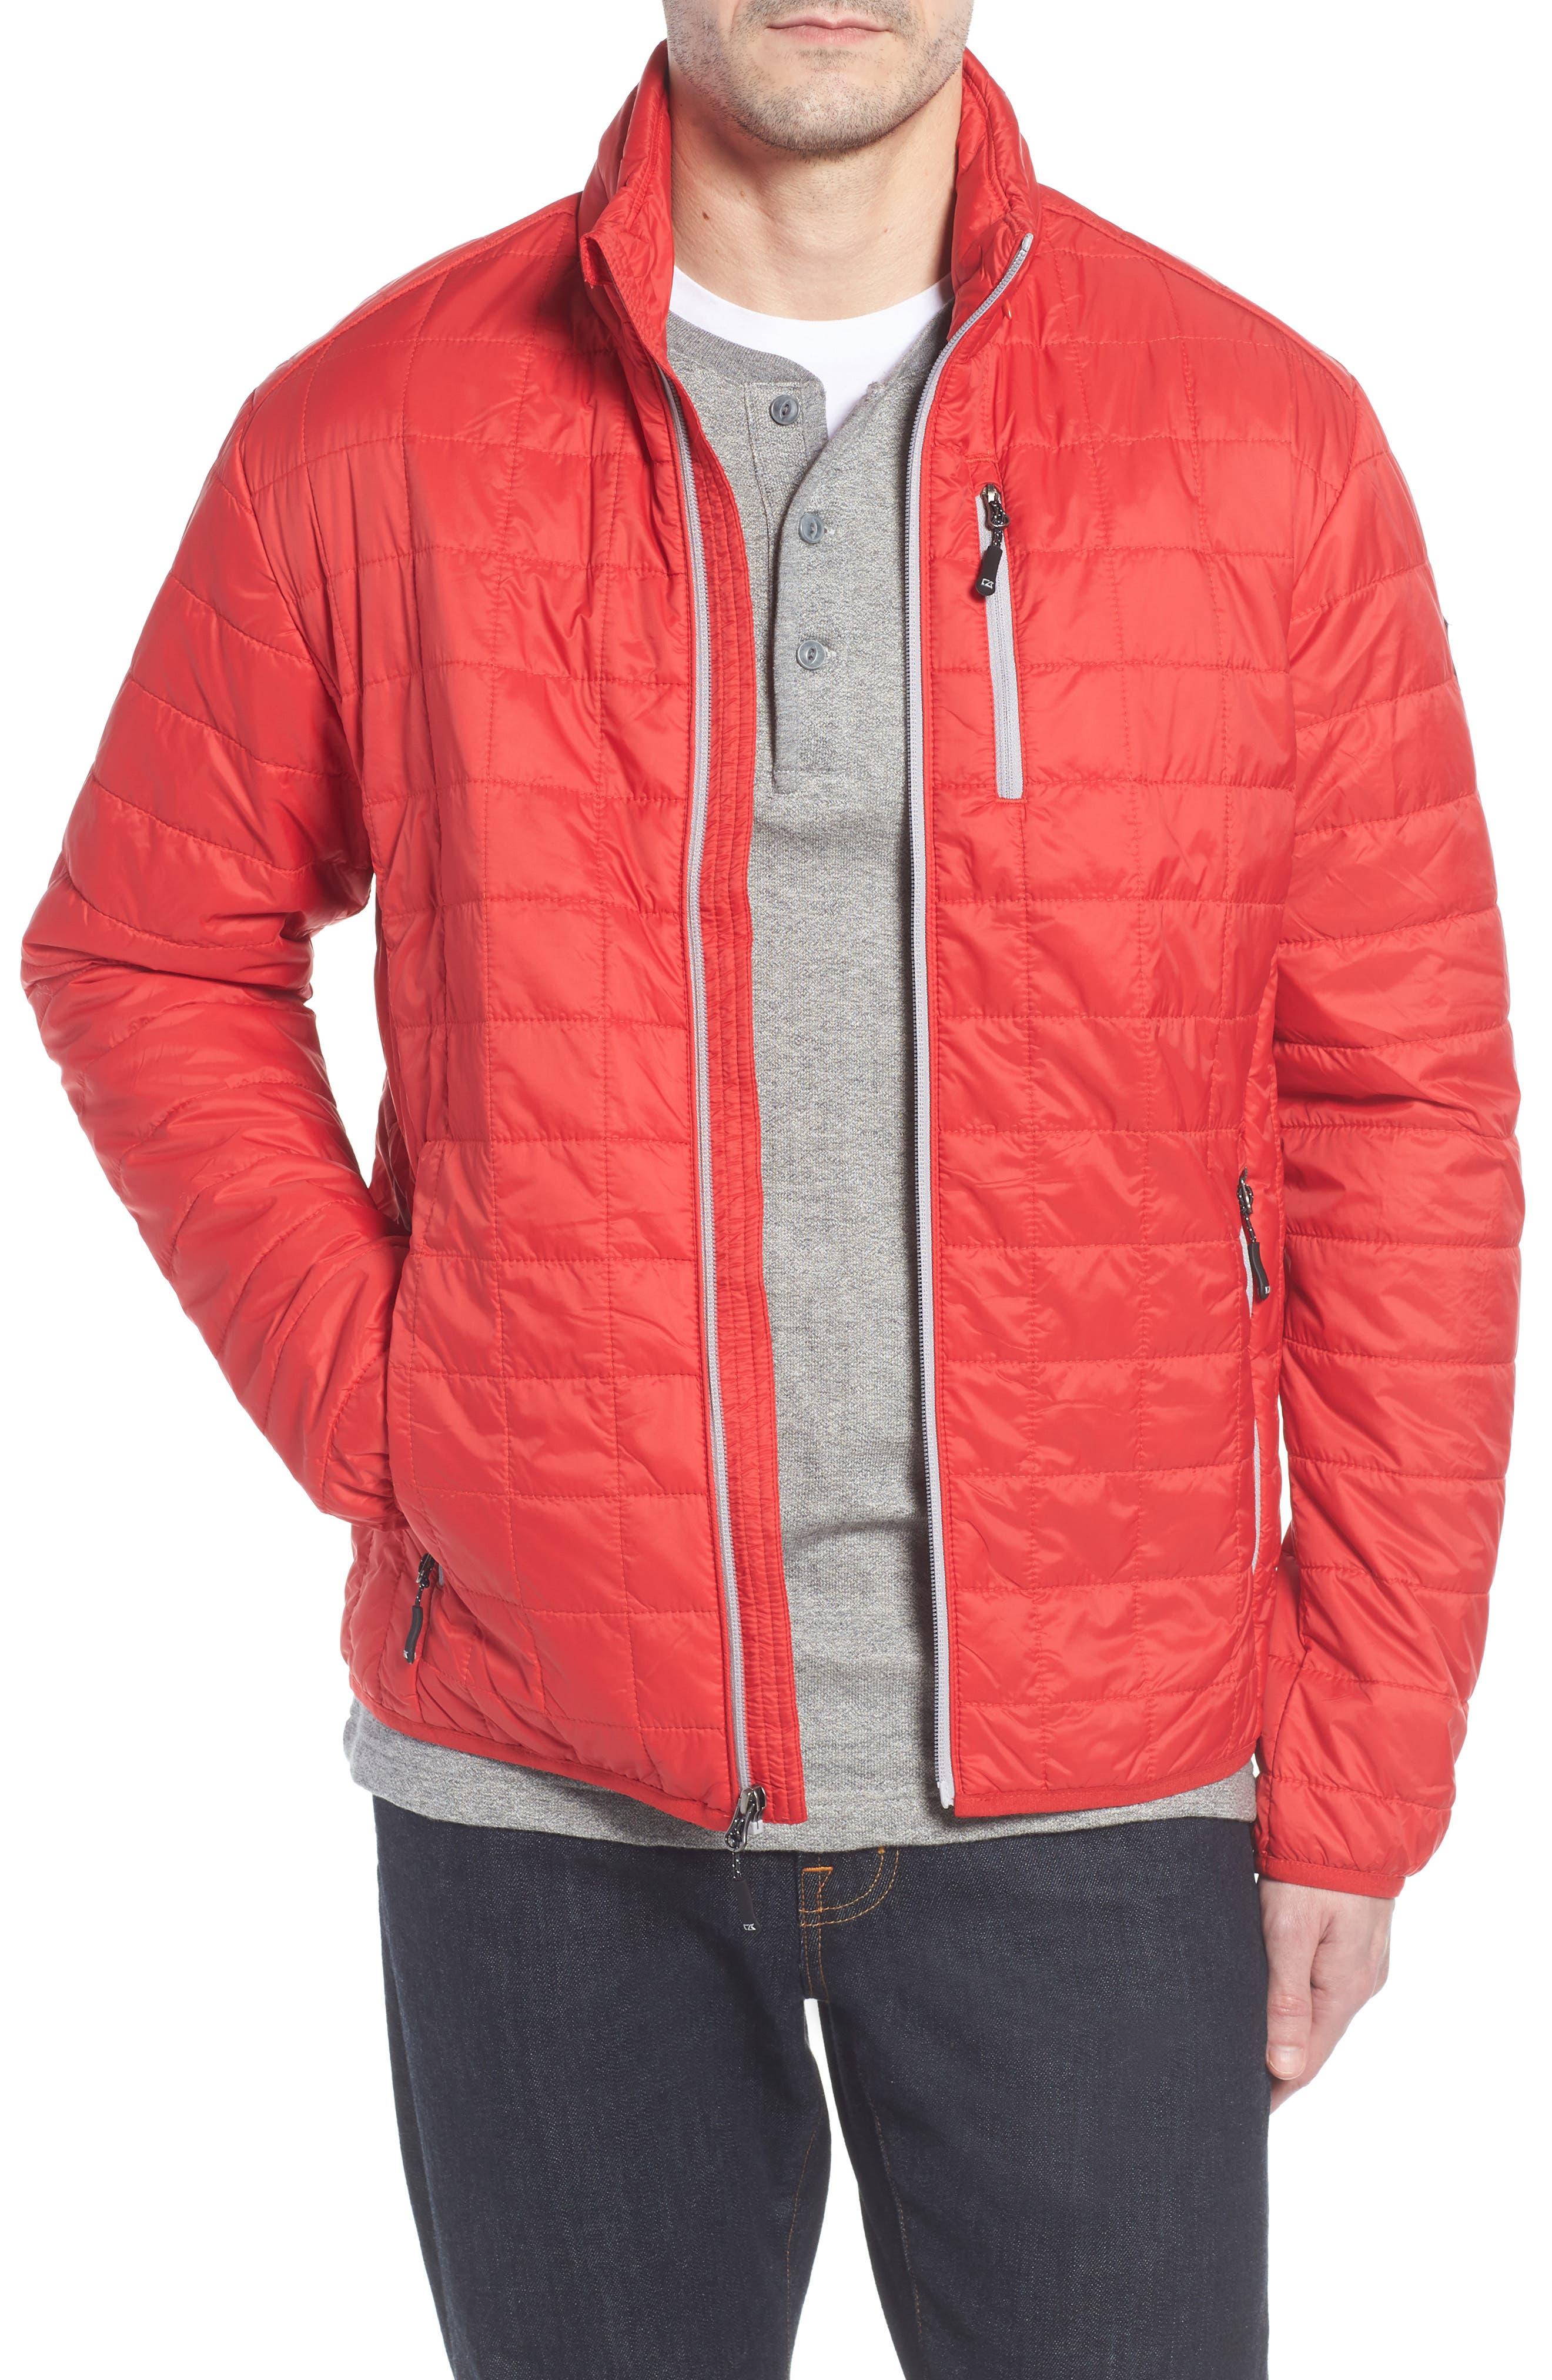 Big & Tall Cutter & Buck Rainier Primaloft Insulated Jacket, Red